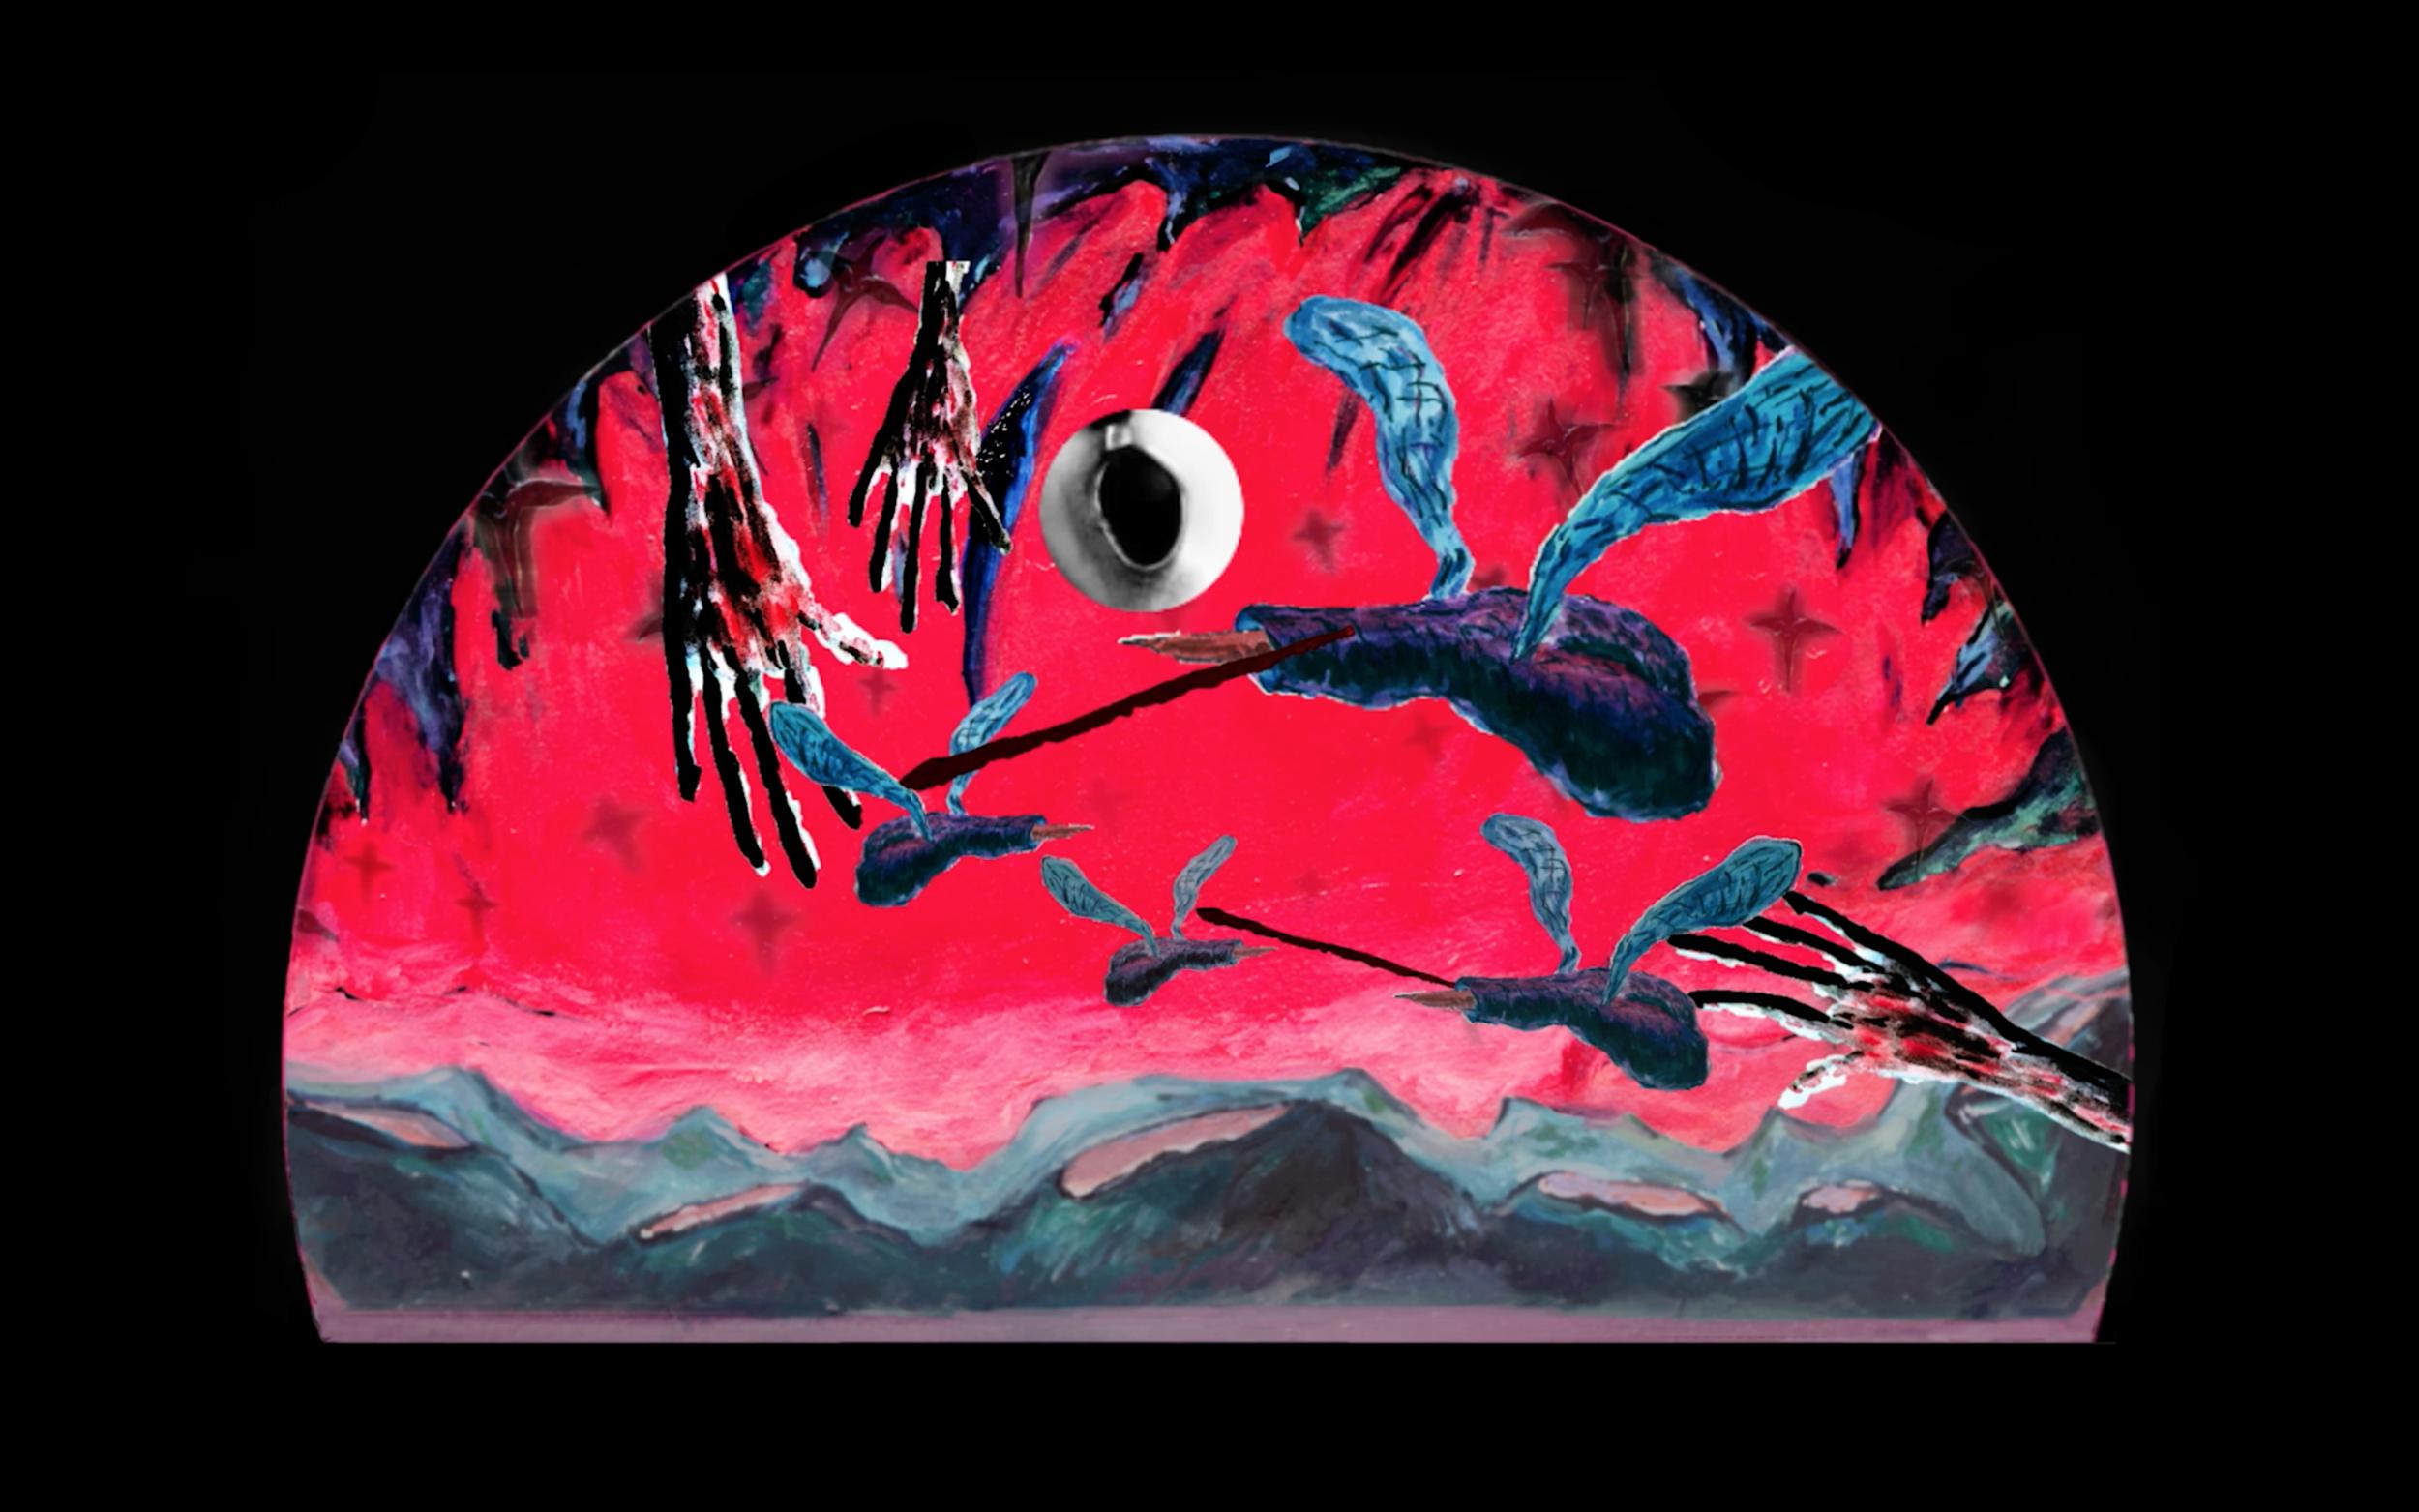 李泽易-红色 鸟 和 洞穴-4K动画-05:18''-2018(6).png